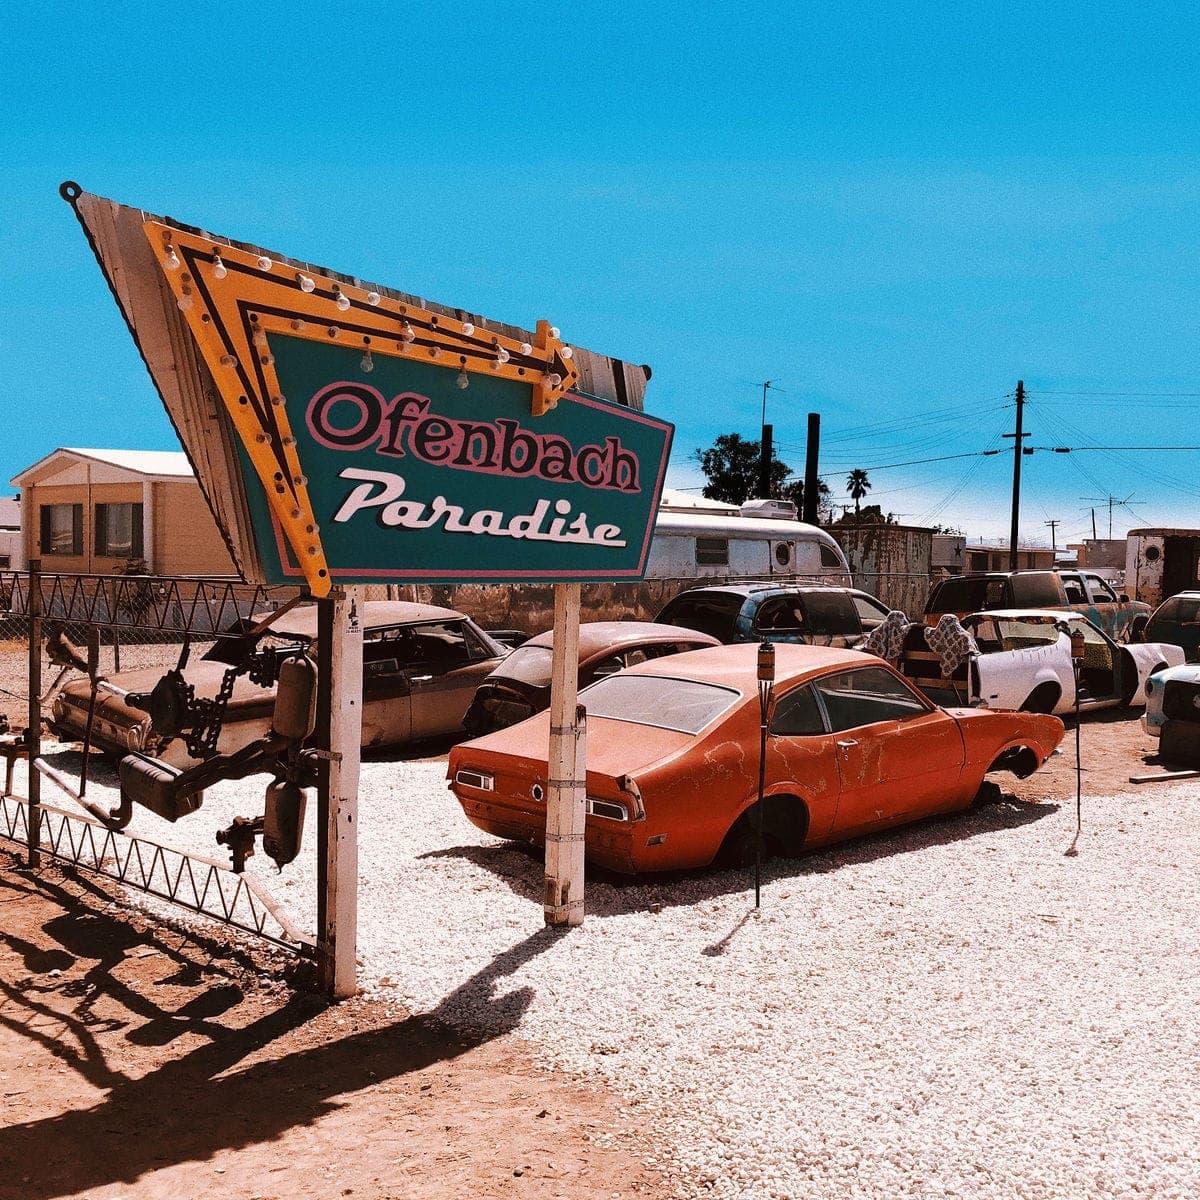 Paradise (feat. Benjamin Ingrosso) - Ofenbach